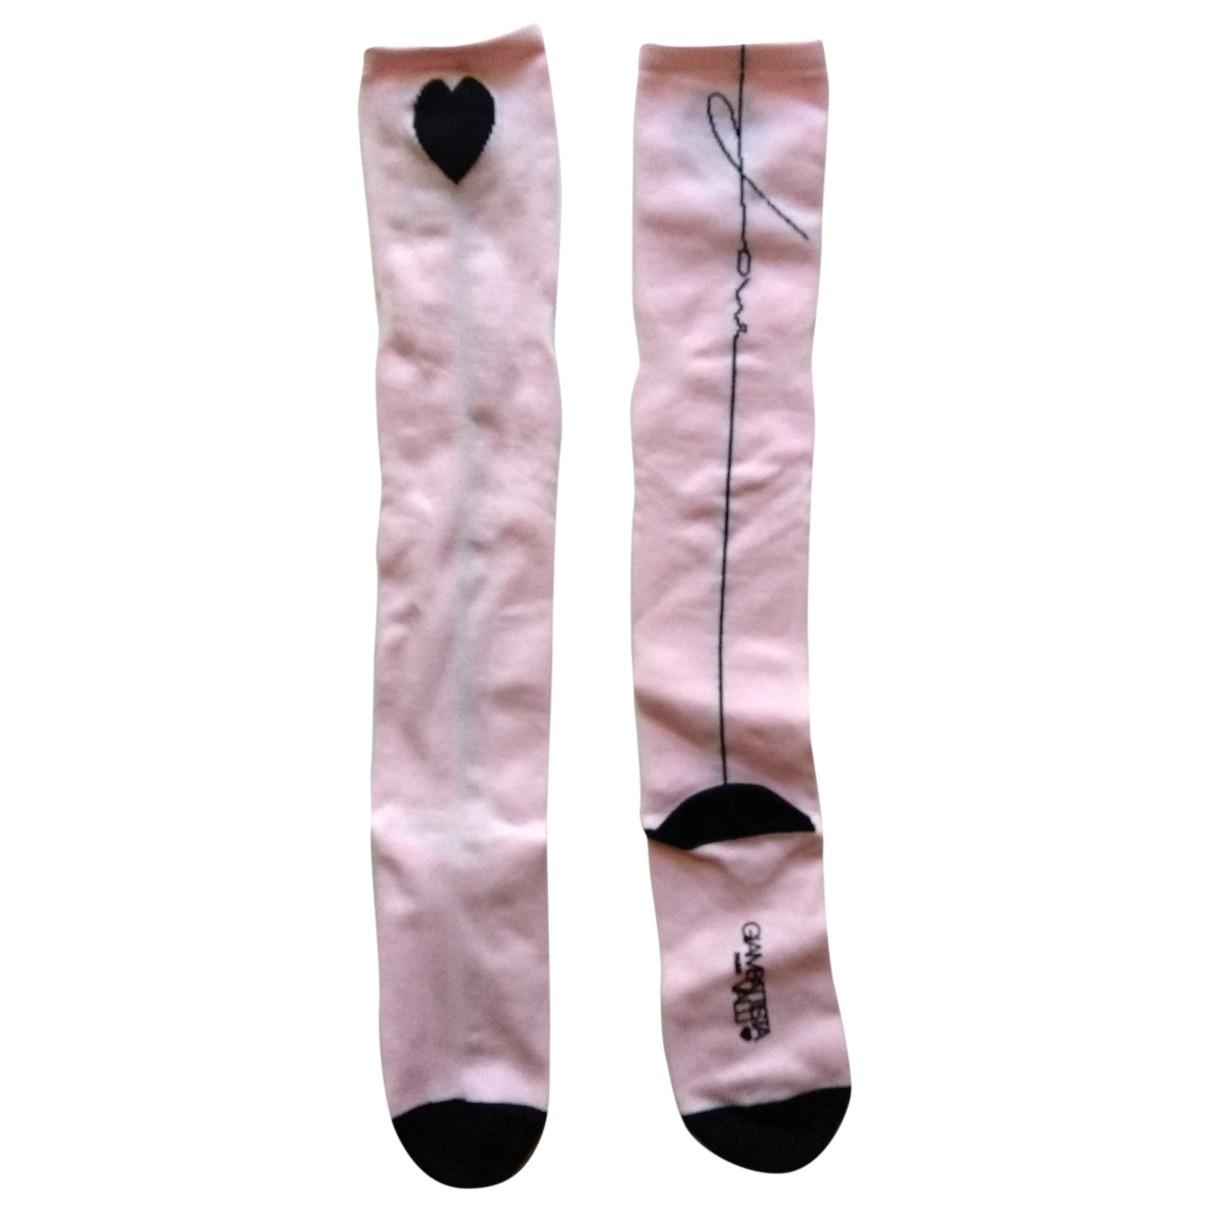 Giambattista Valli X H&m \N Pink Cotton Shorts for Women One Size UK